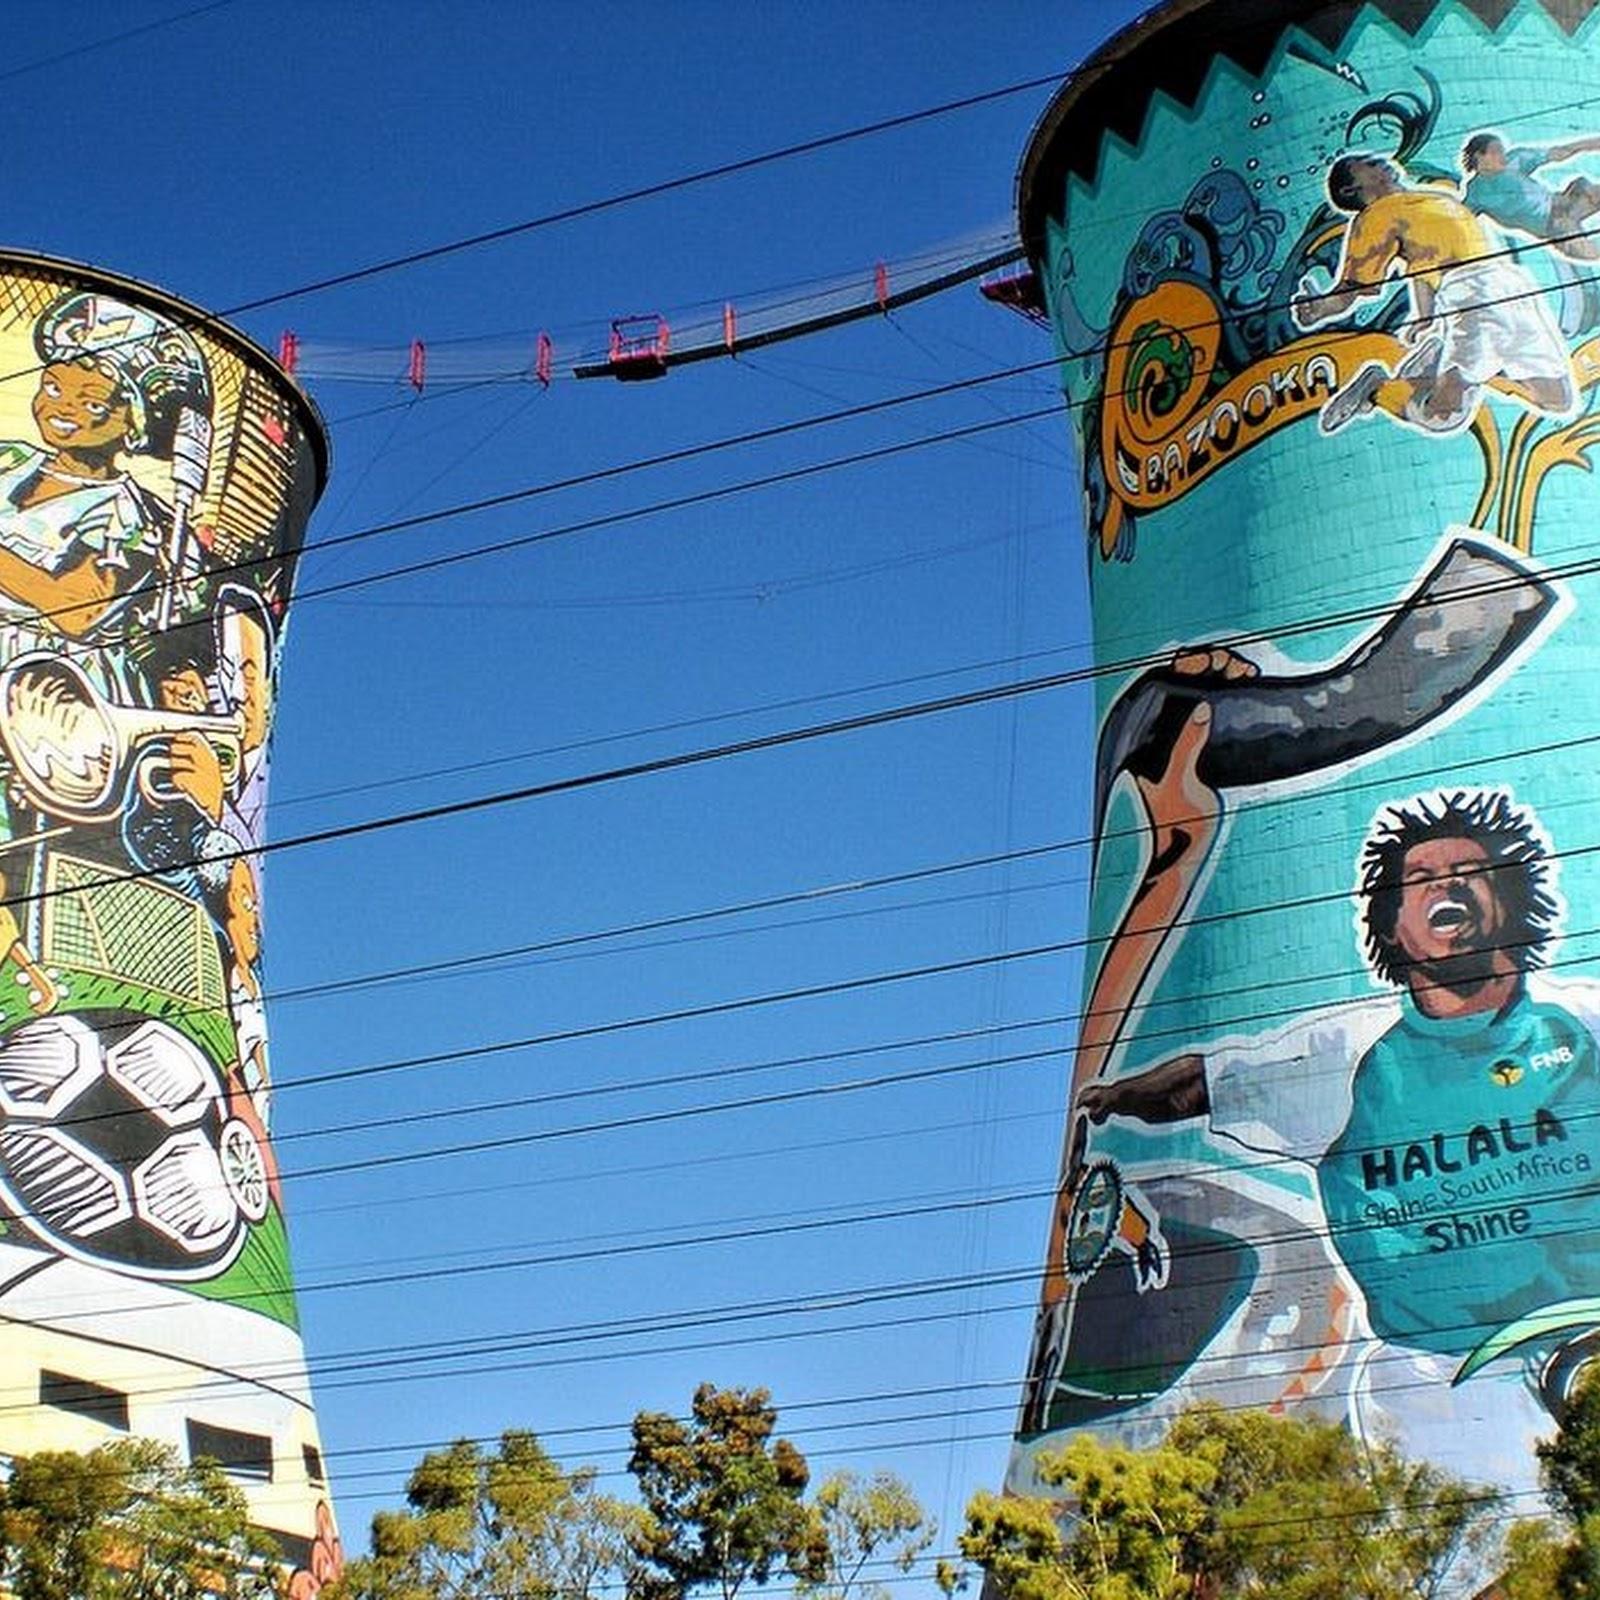 Orlando Towers in Johannesburg